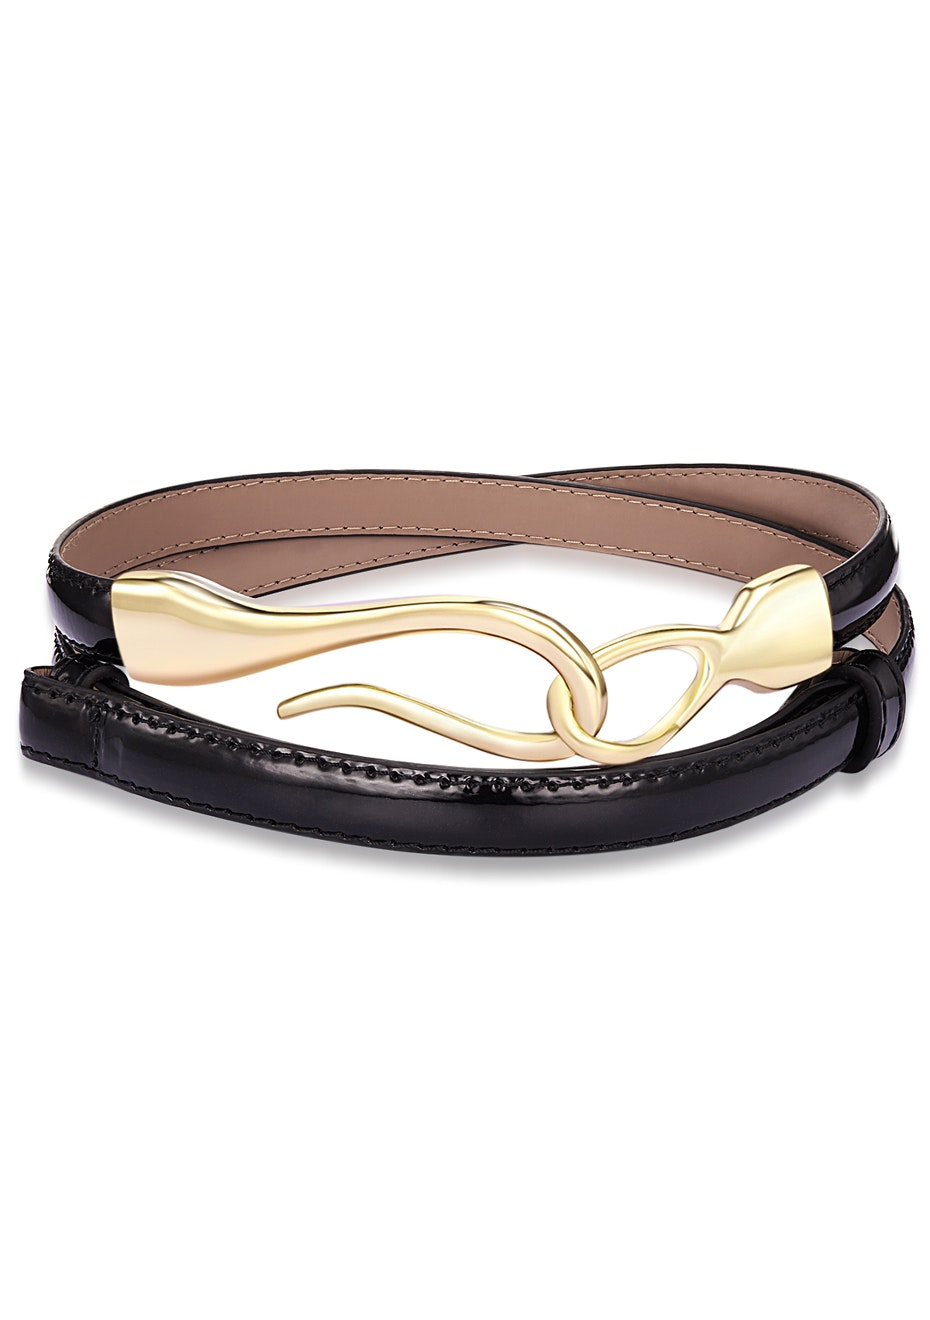 Genuine Cow Leather Skinny Waist Belt-Aurora black